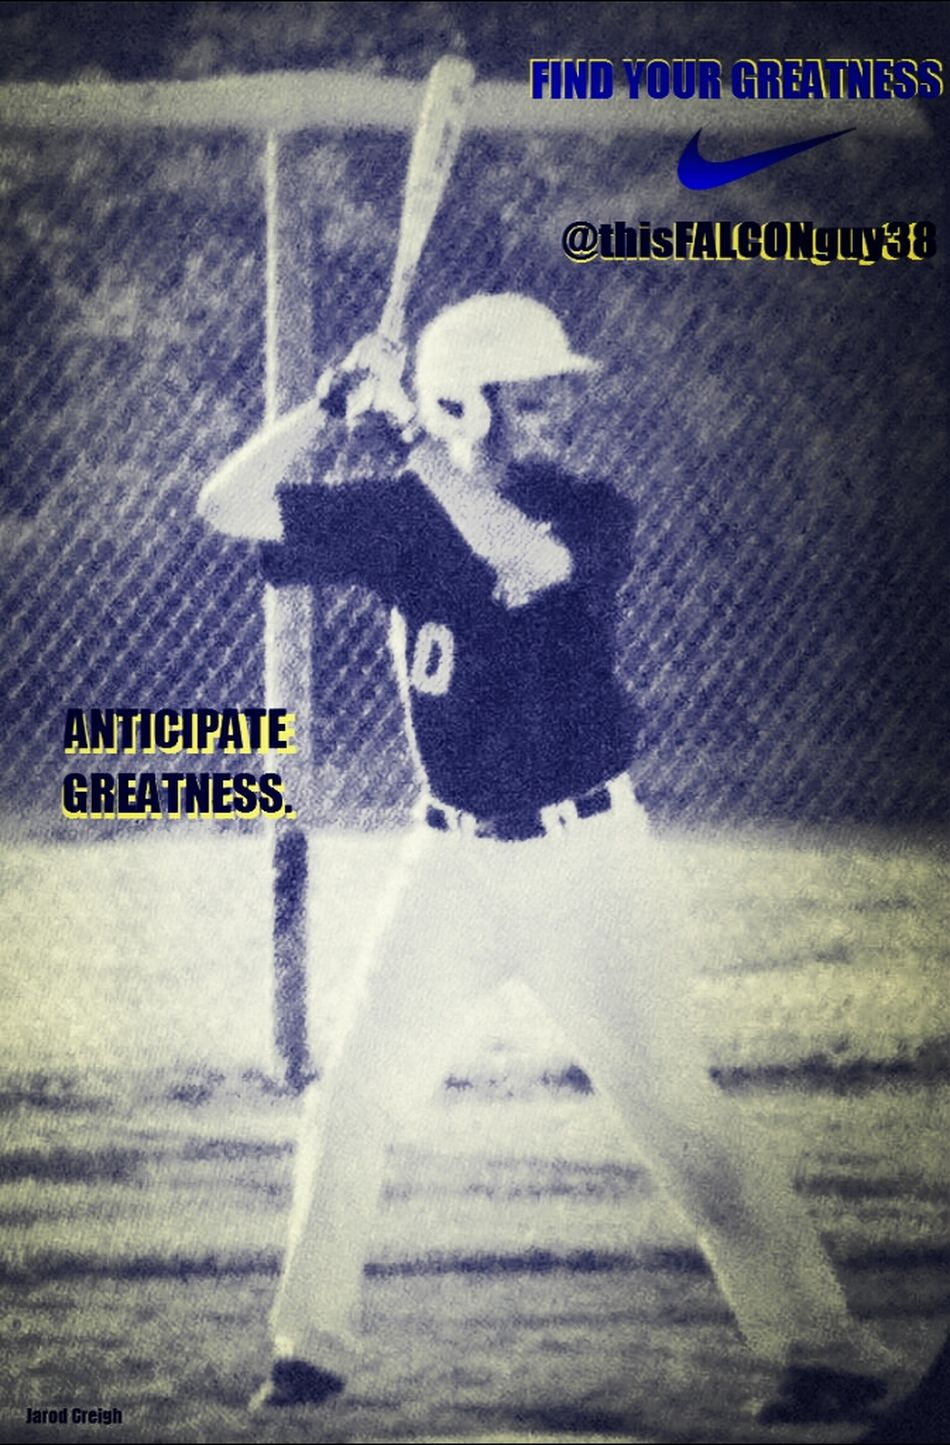 Anticipate Greatness.